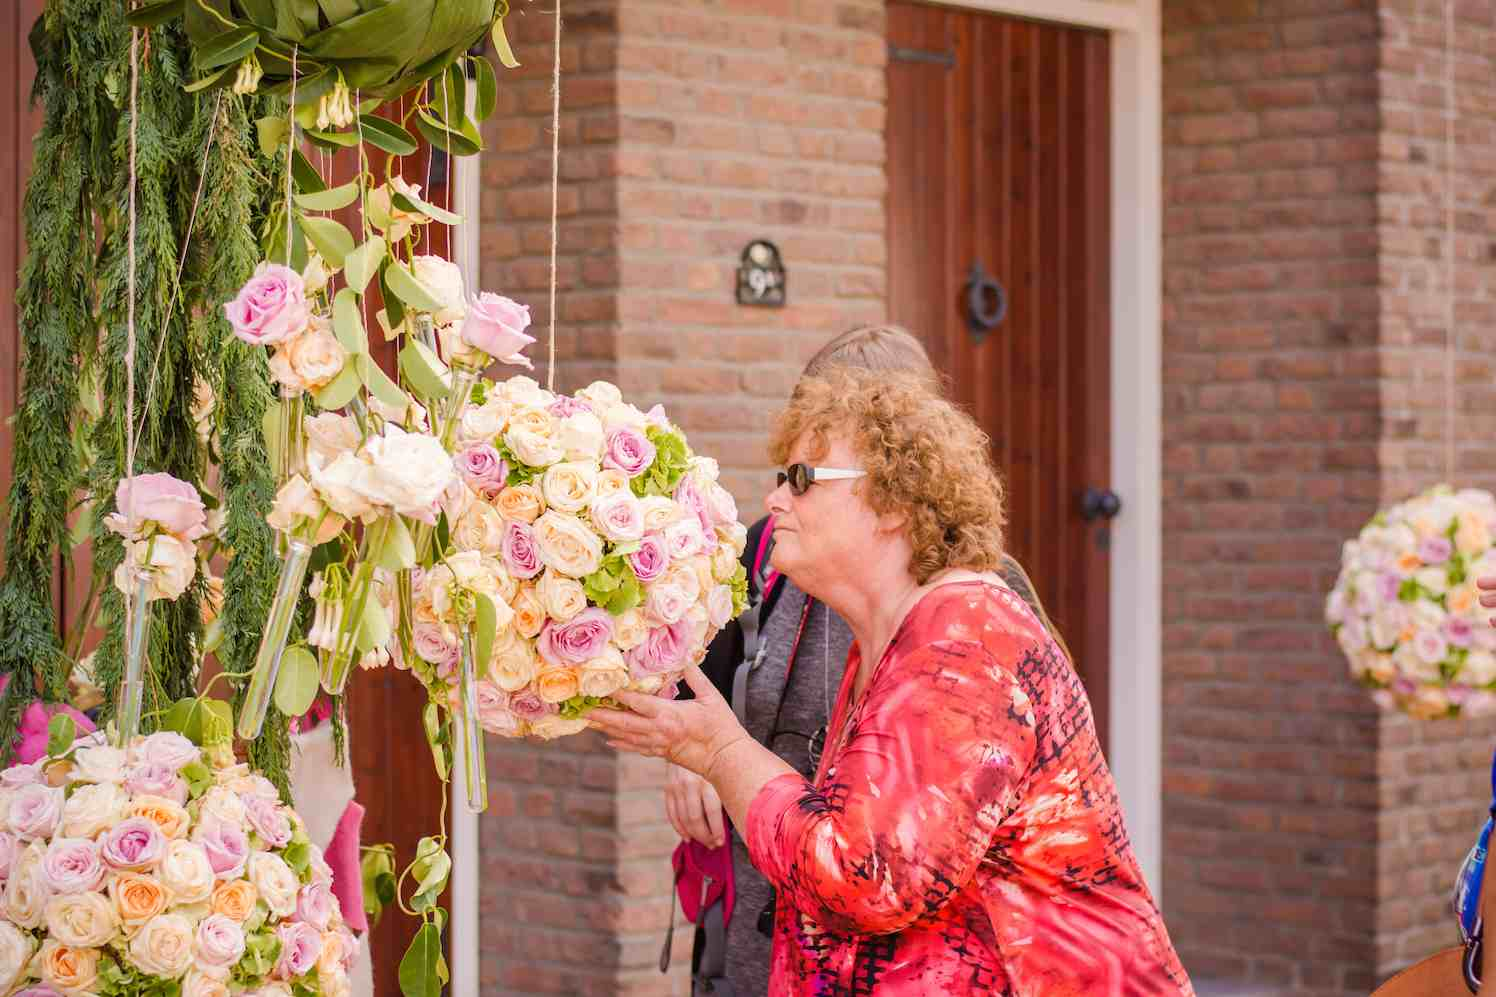 rozenfestival in Lottum 2018